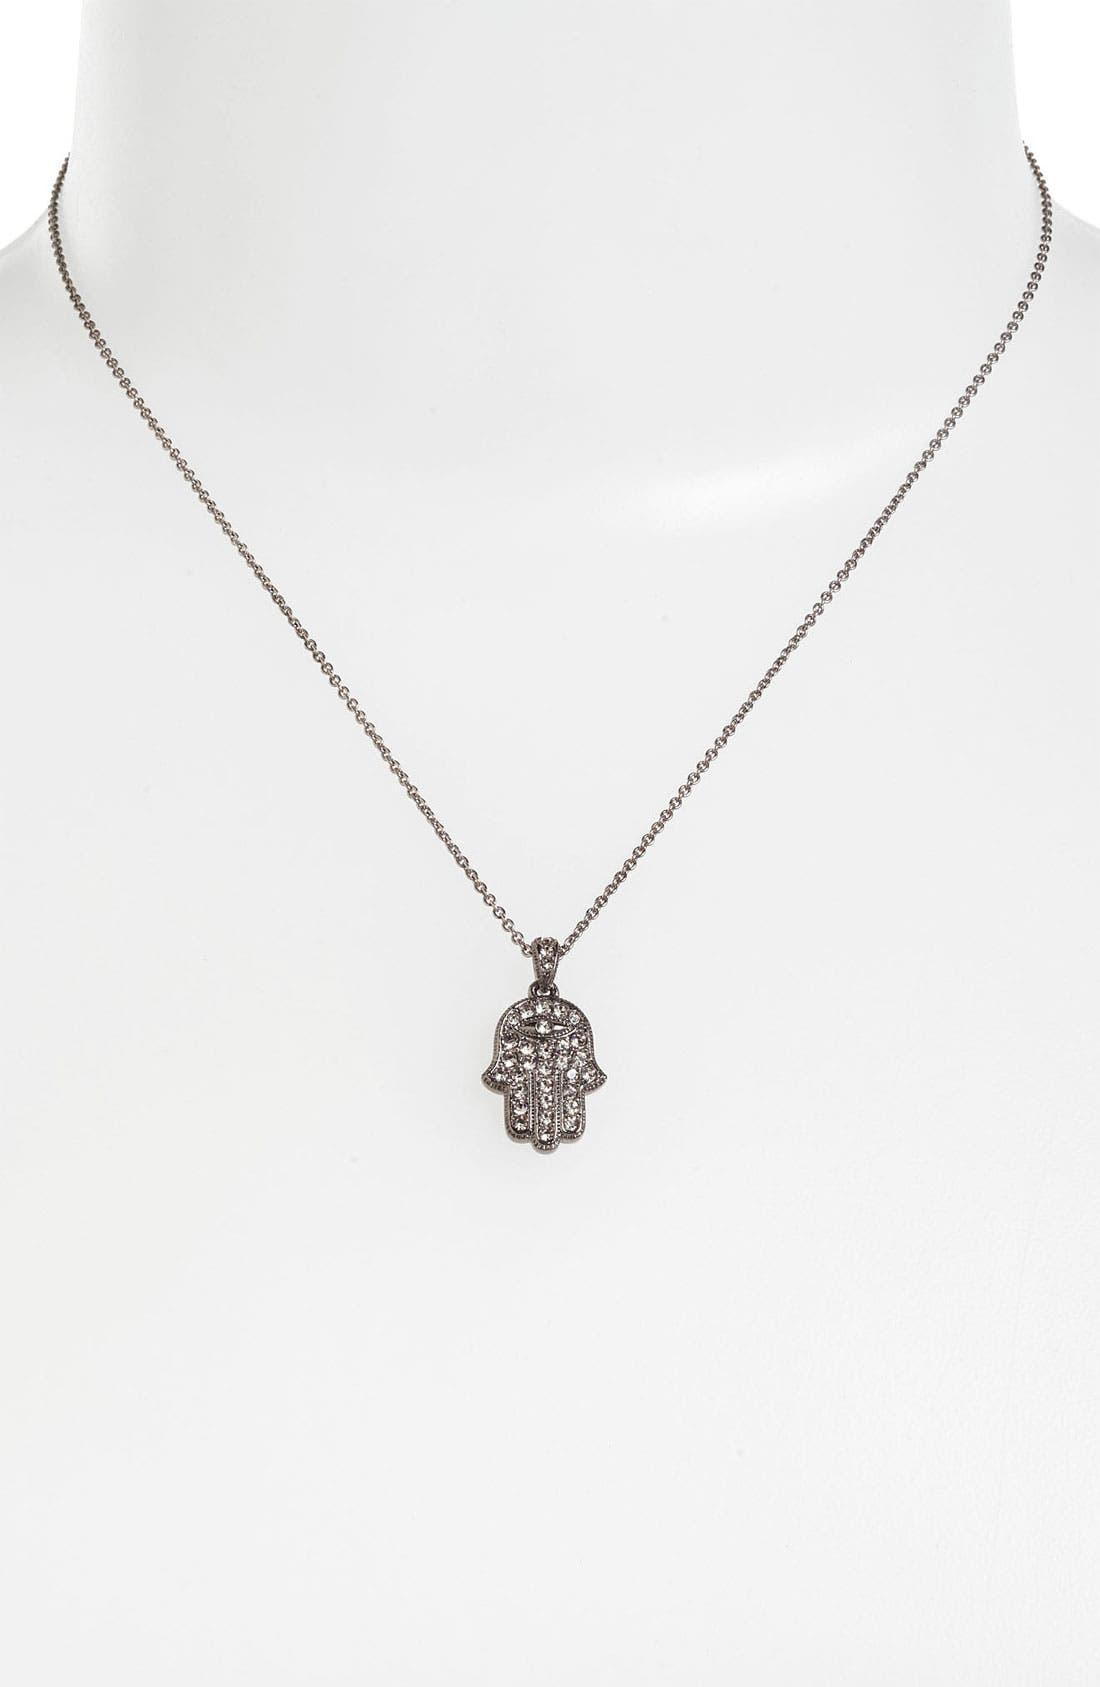 Hamsa Pendant Necklace,                             Alternate thumbnail 2, color,                             001